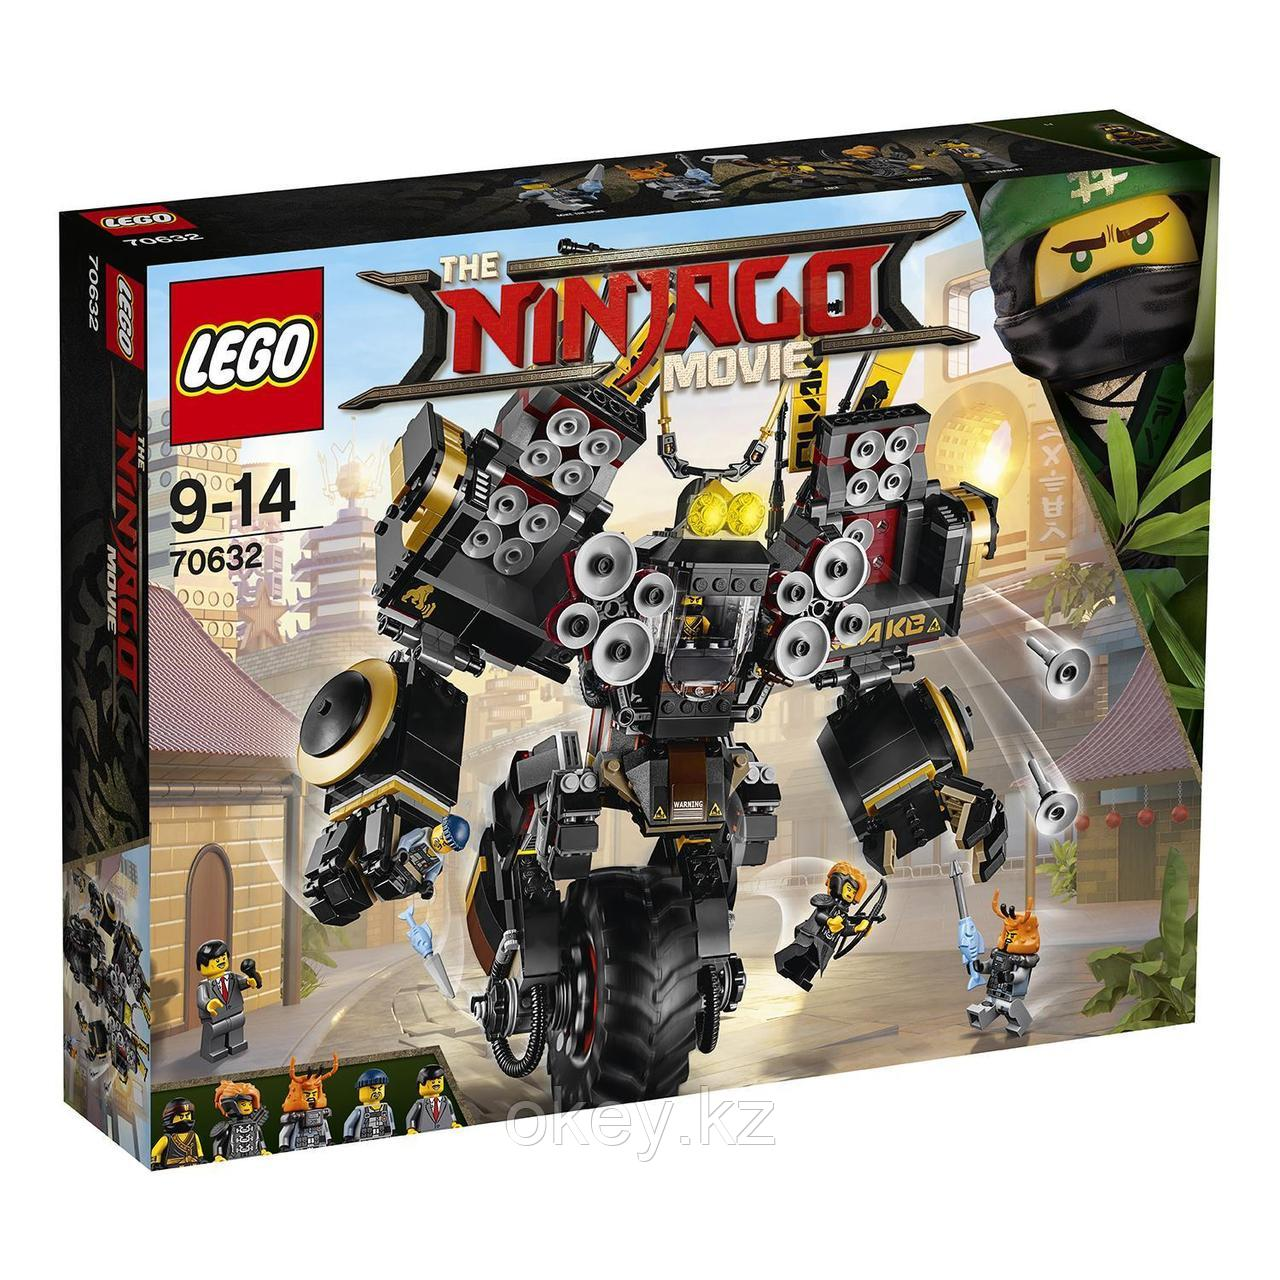 LEGO Ninjago Movie: Робот землетрясений 70632 - фото 1